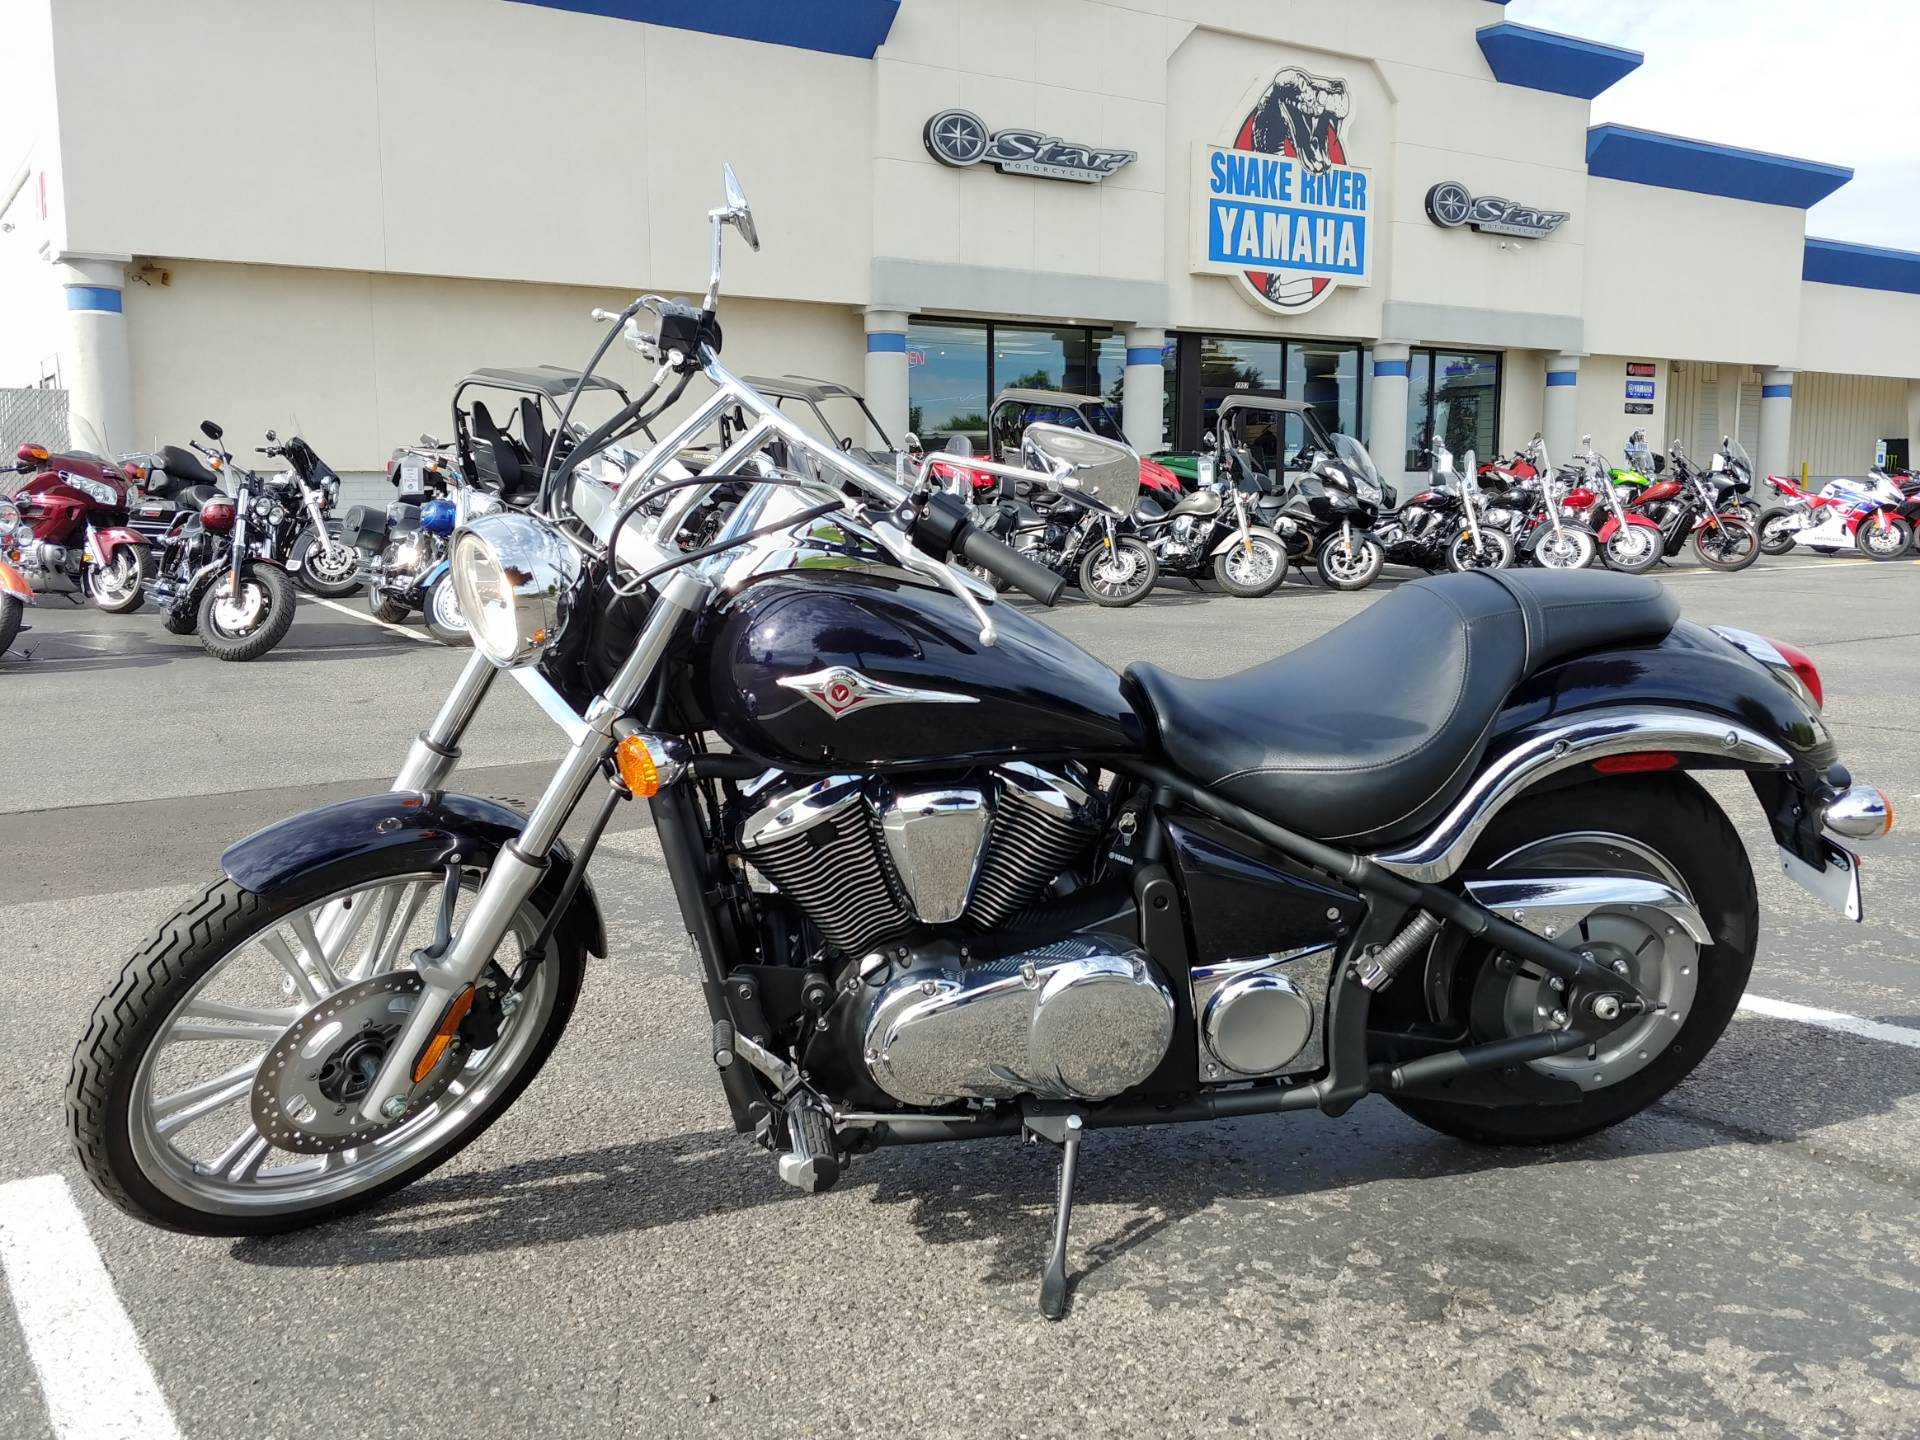 Used 2012 Kawasaki Vulcan® 900 Custom Motorcycles in Meridian, ID